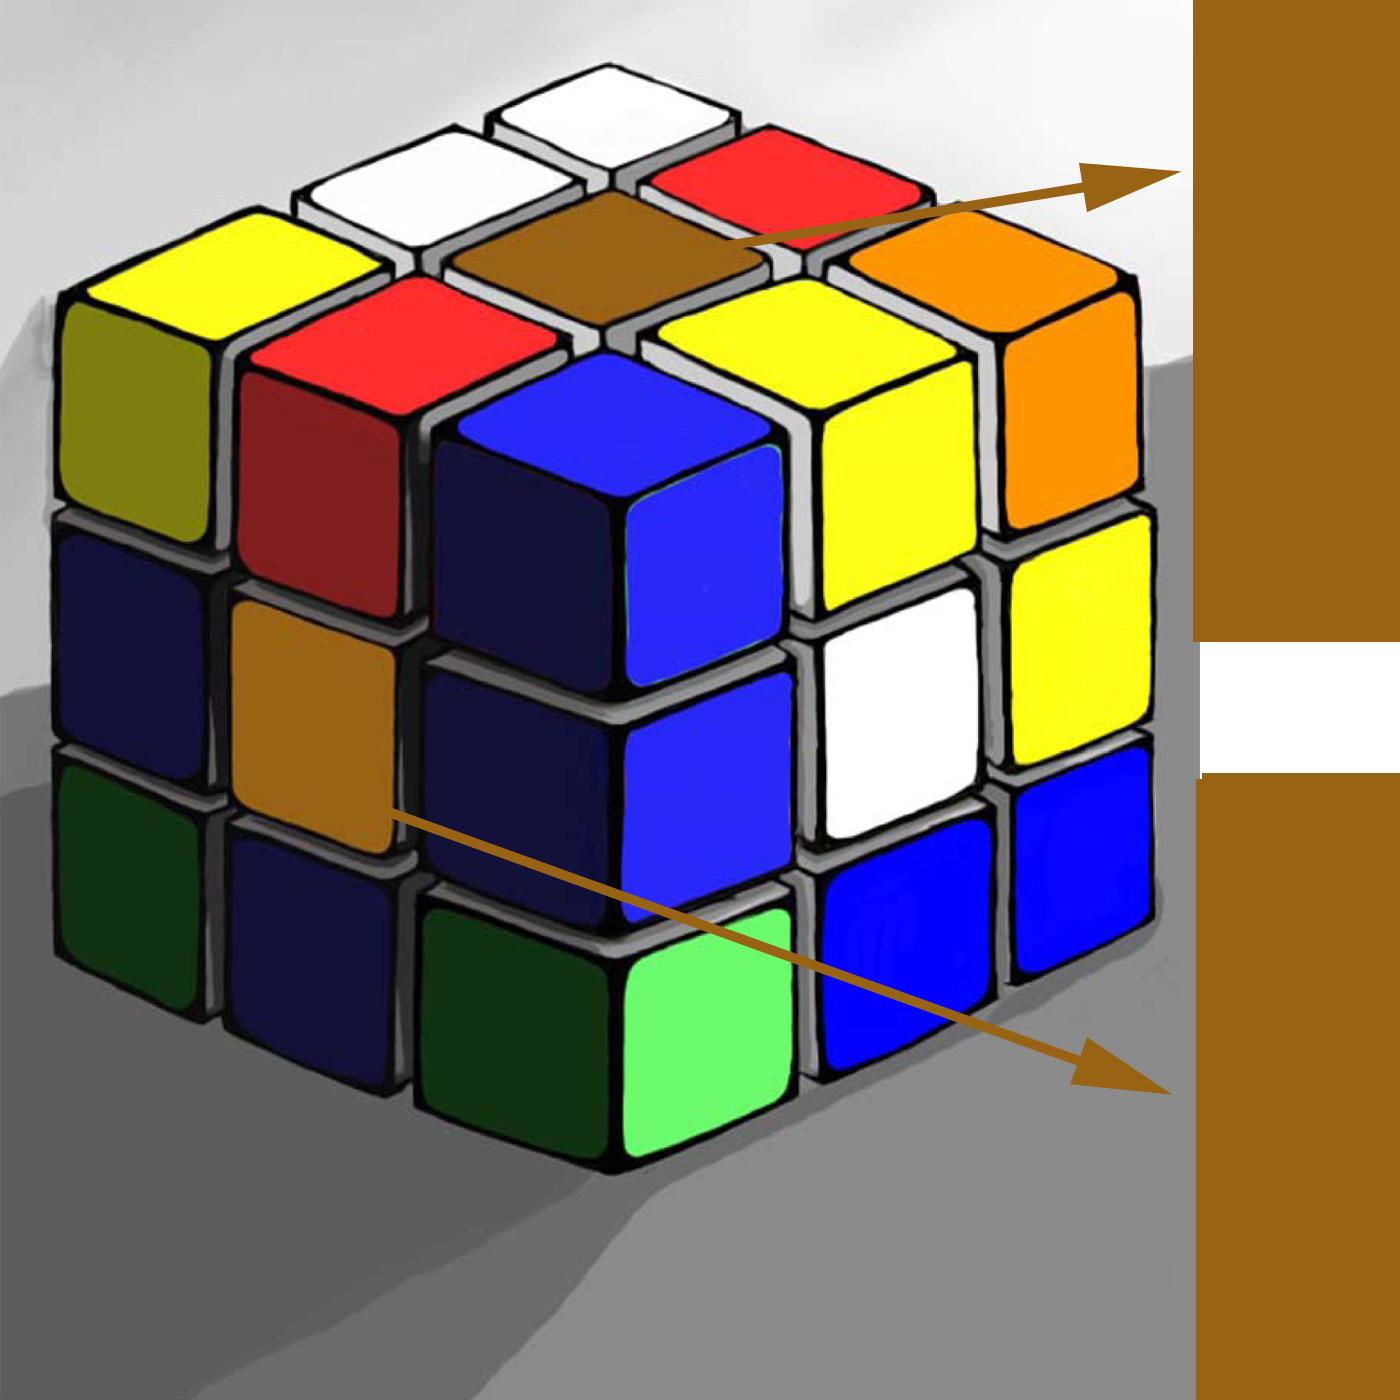 Kleurperceptie: Kubus - oranje - geel - bruin.